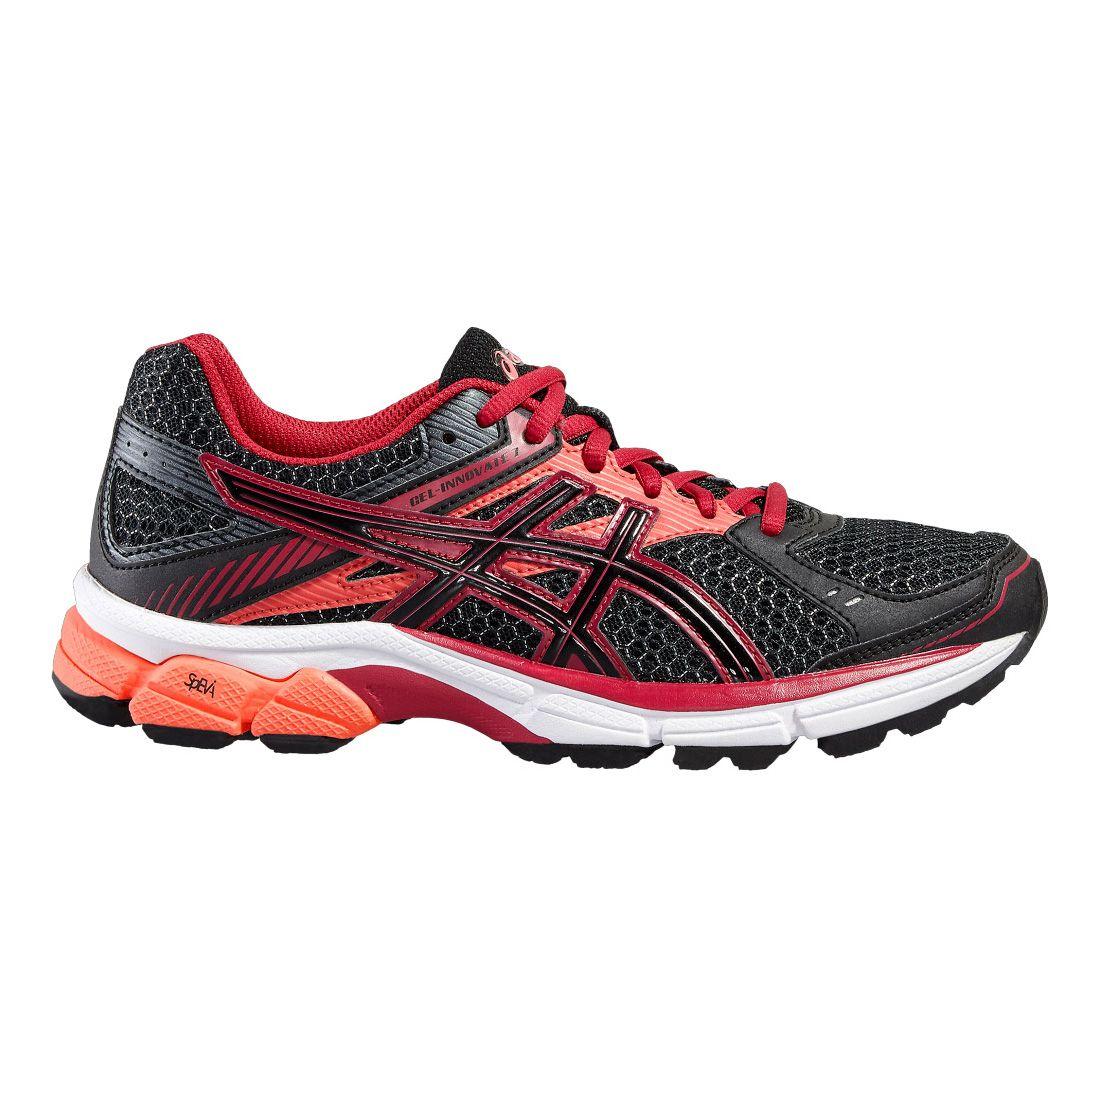 Asics Gel Innovate 7 Ladies Running Shoes Sweatband Com